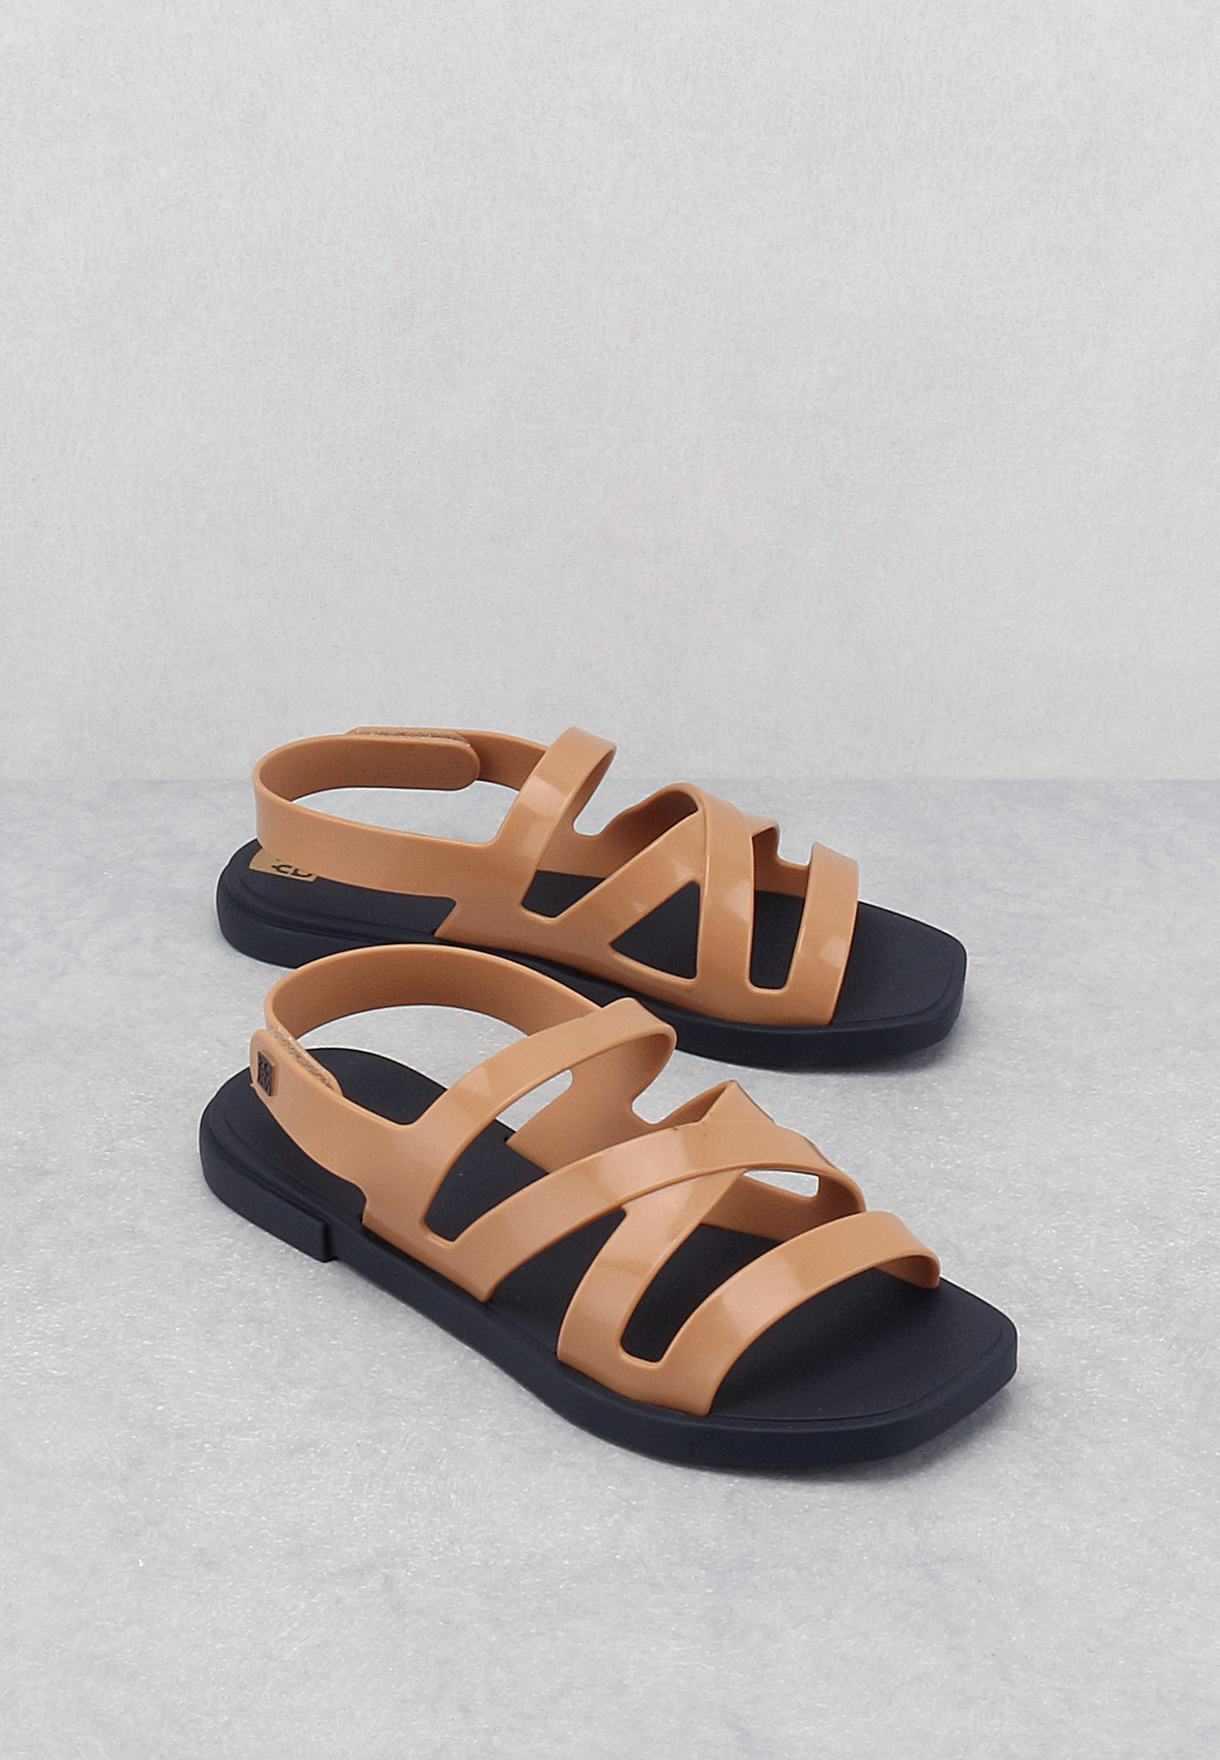 Zaxy Vibes Sandals